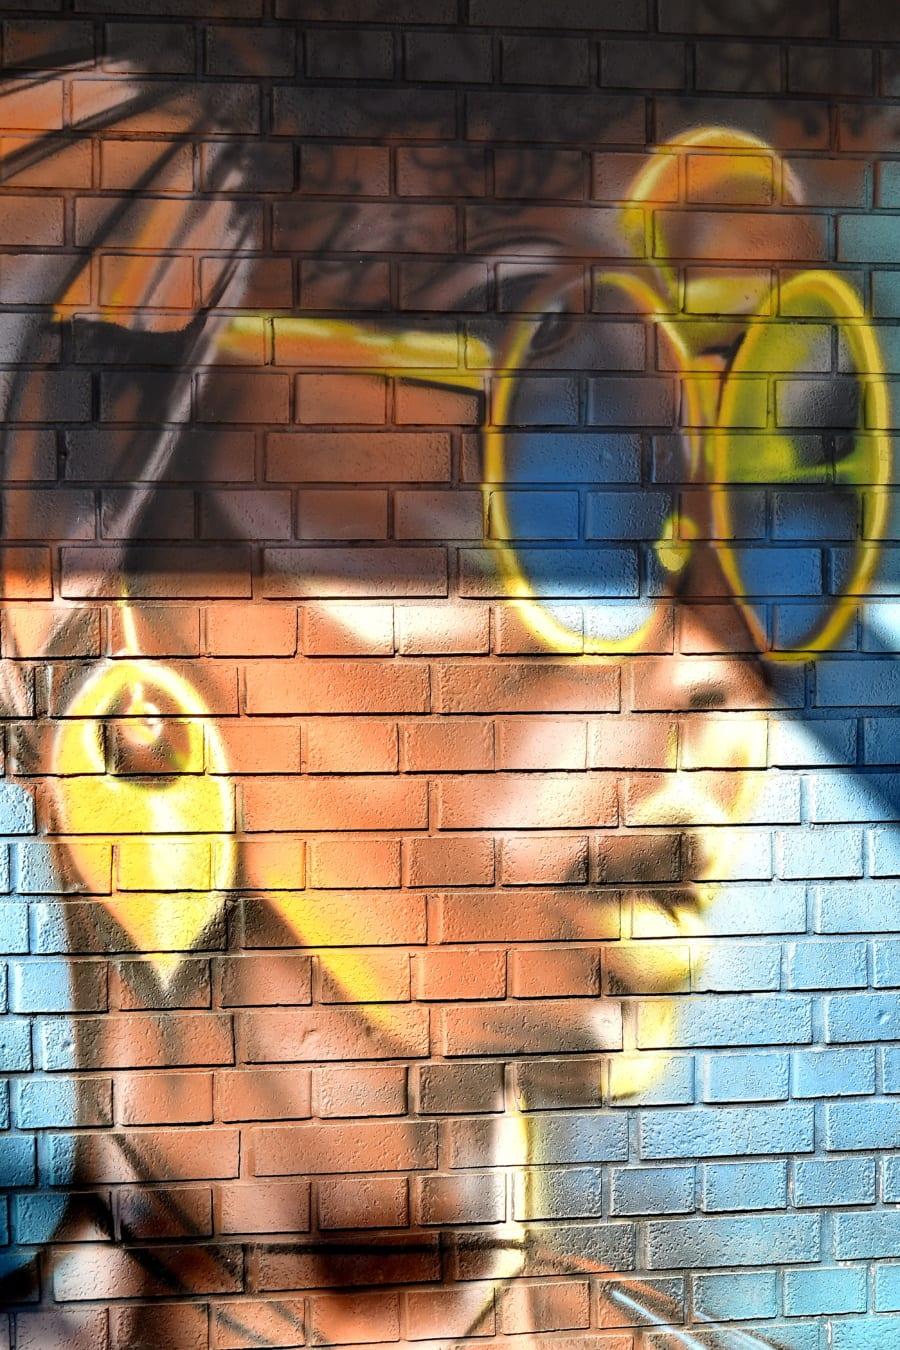 graffiti, eyeglasses, summer time, portrait, face, colorful, bricks, wall, decoration, urban